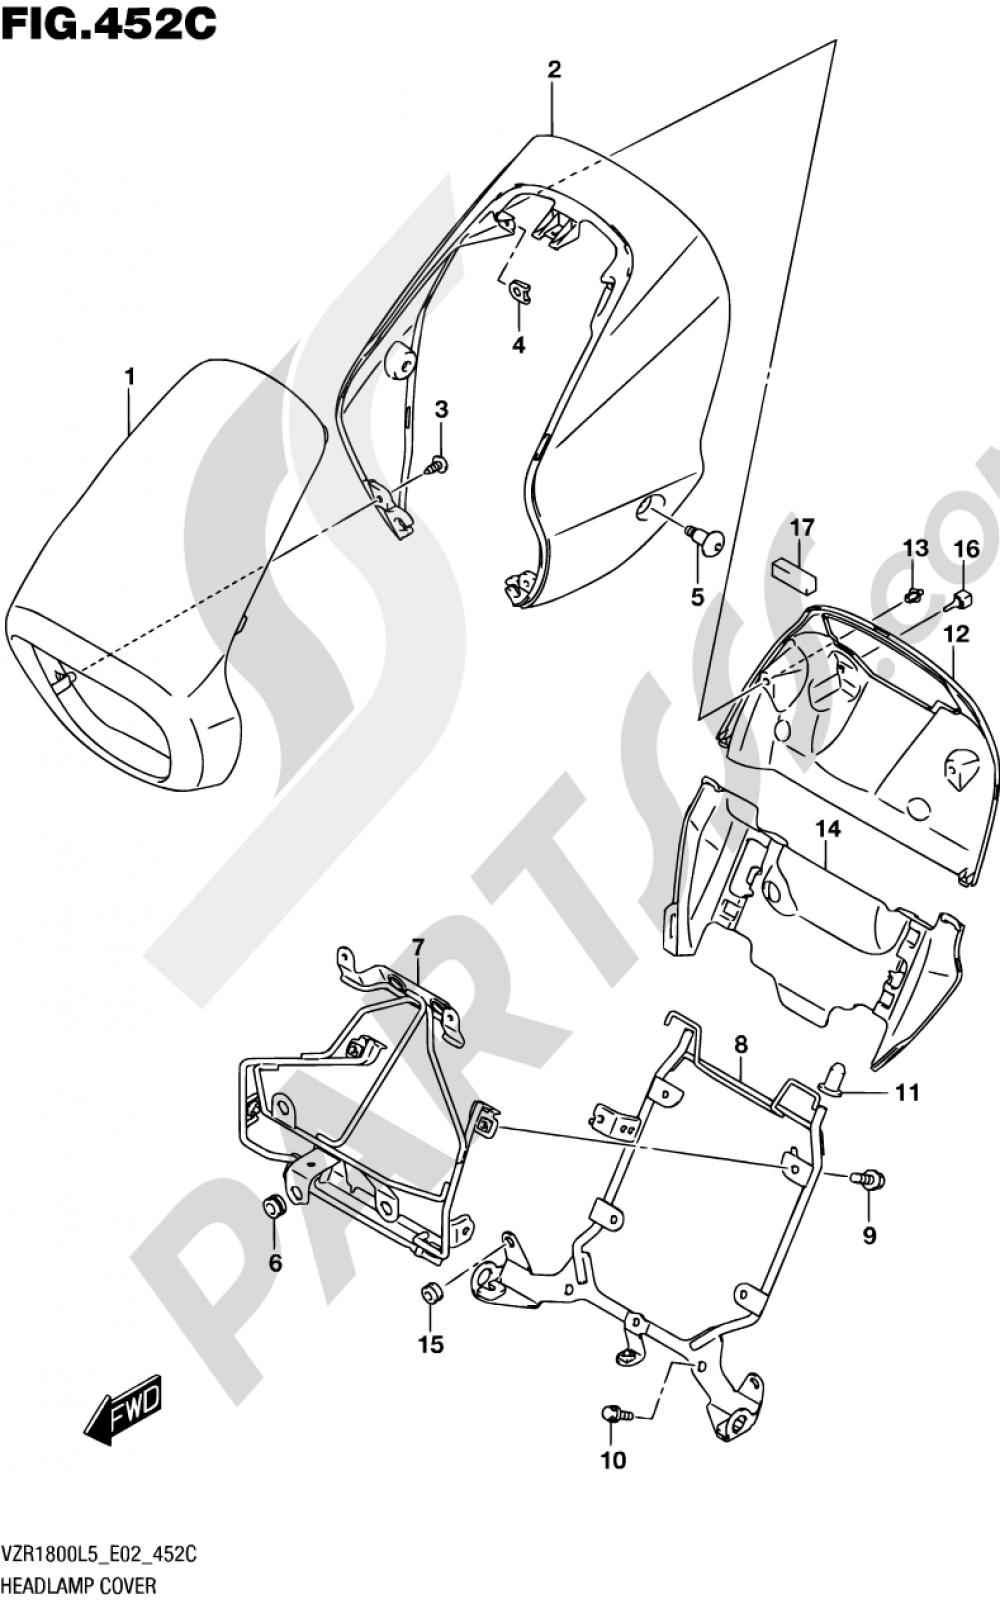 452C - HEADLAMP COVER (VZR1800UFL5 E19) Suzuki VZR1800BZ 2015